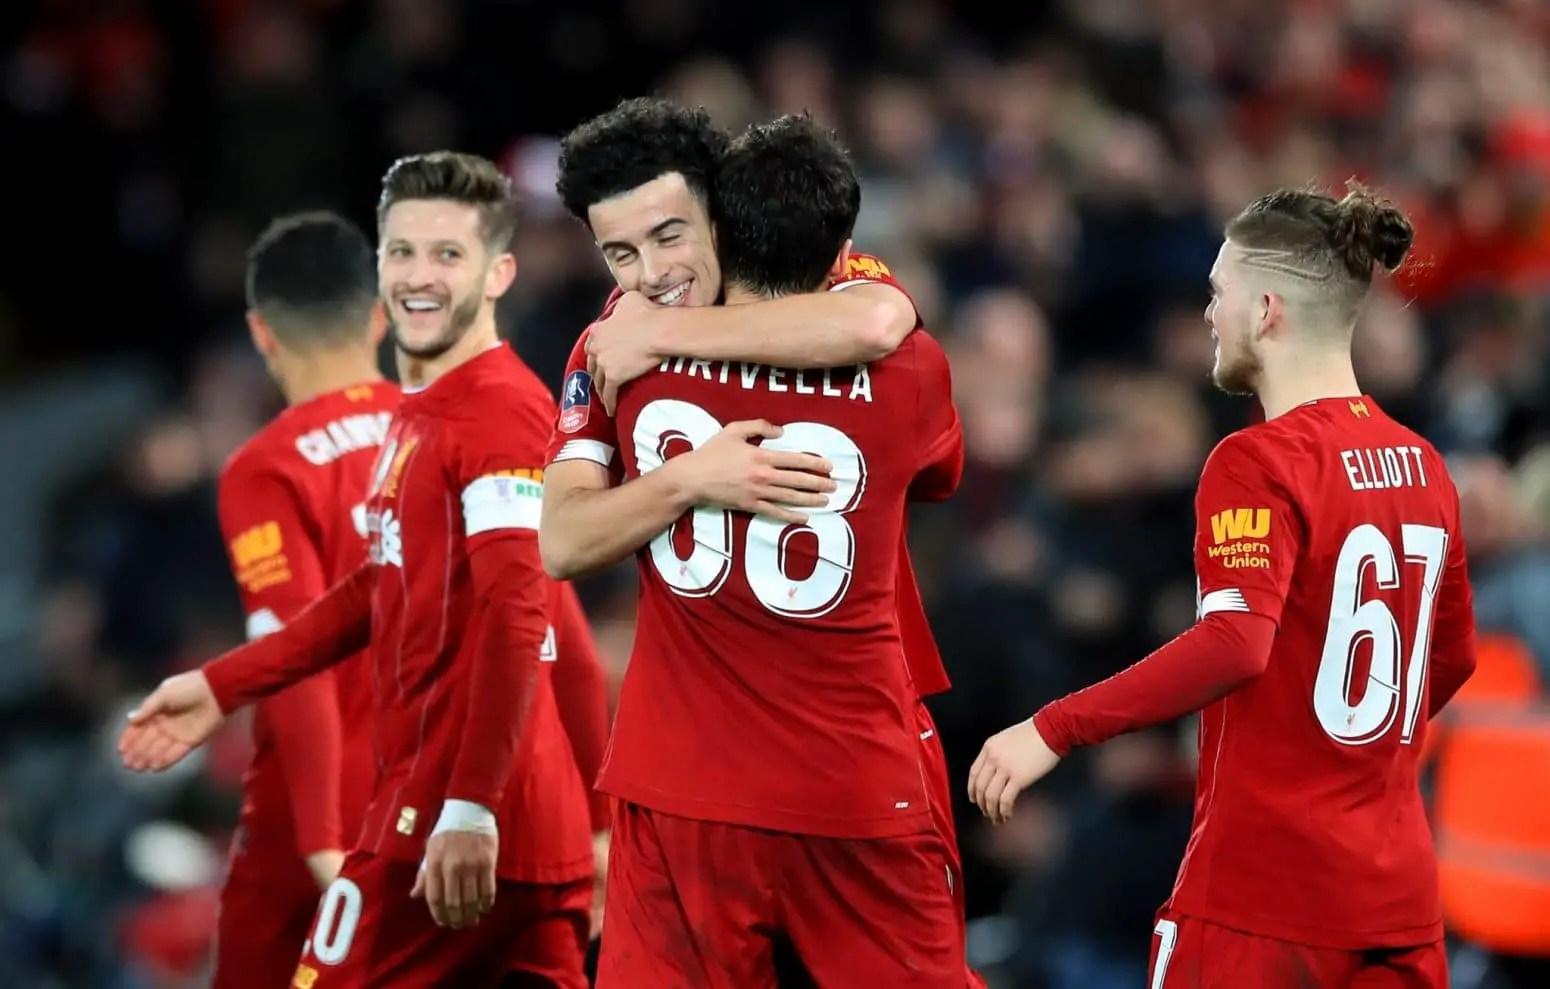 Liverpool 1-0 Everton – Highlights: Curtis Jones wonder-goal downs Everton (Video)